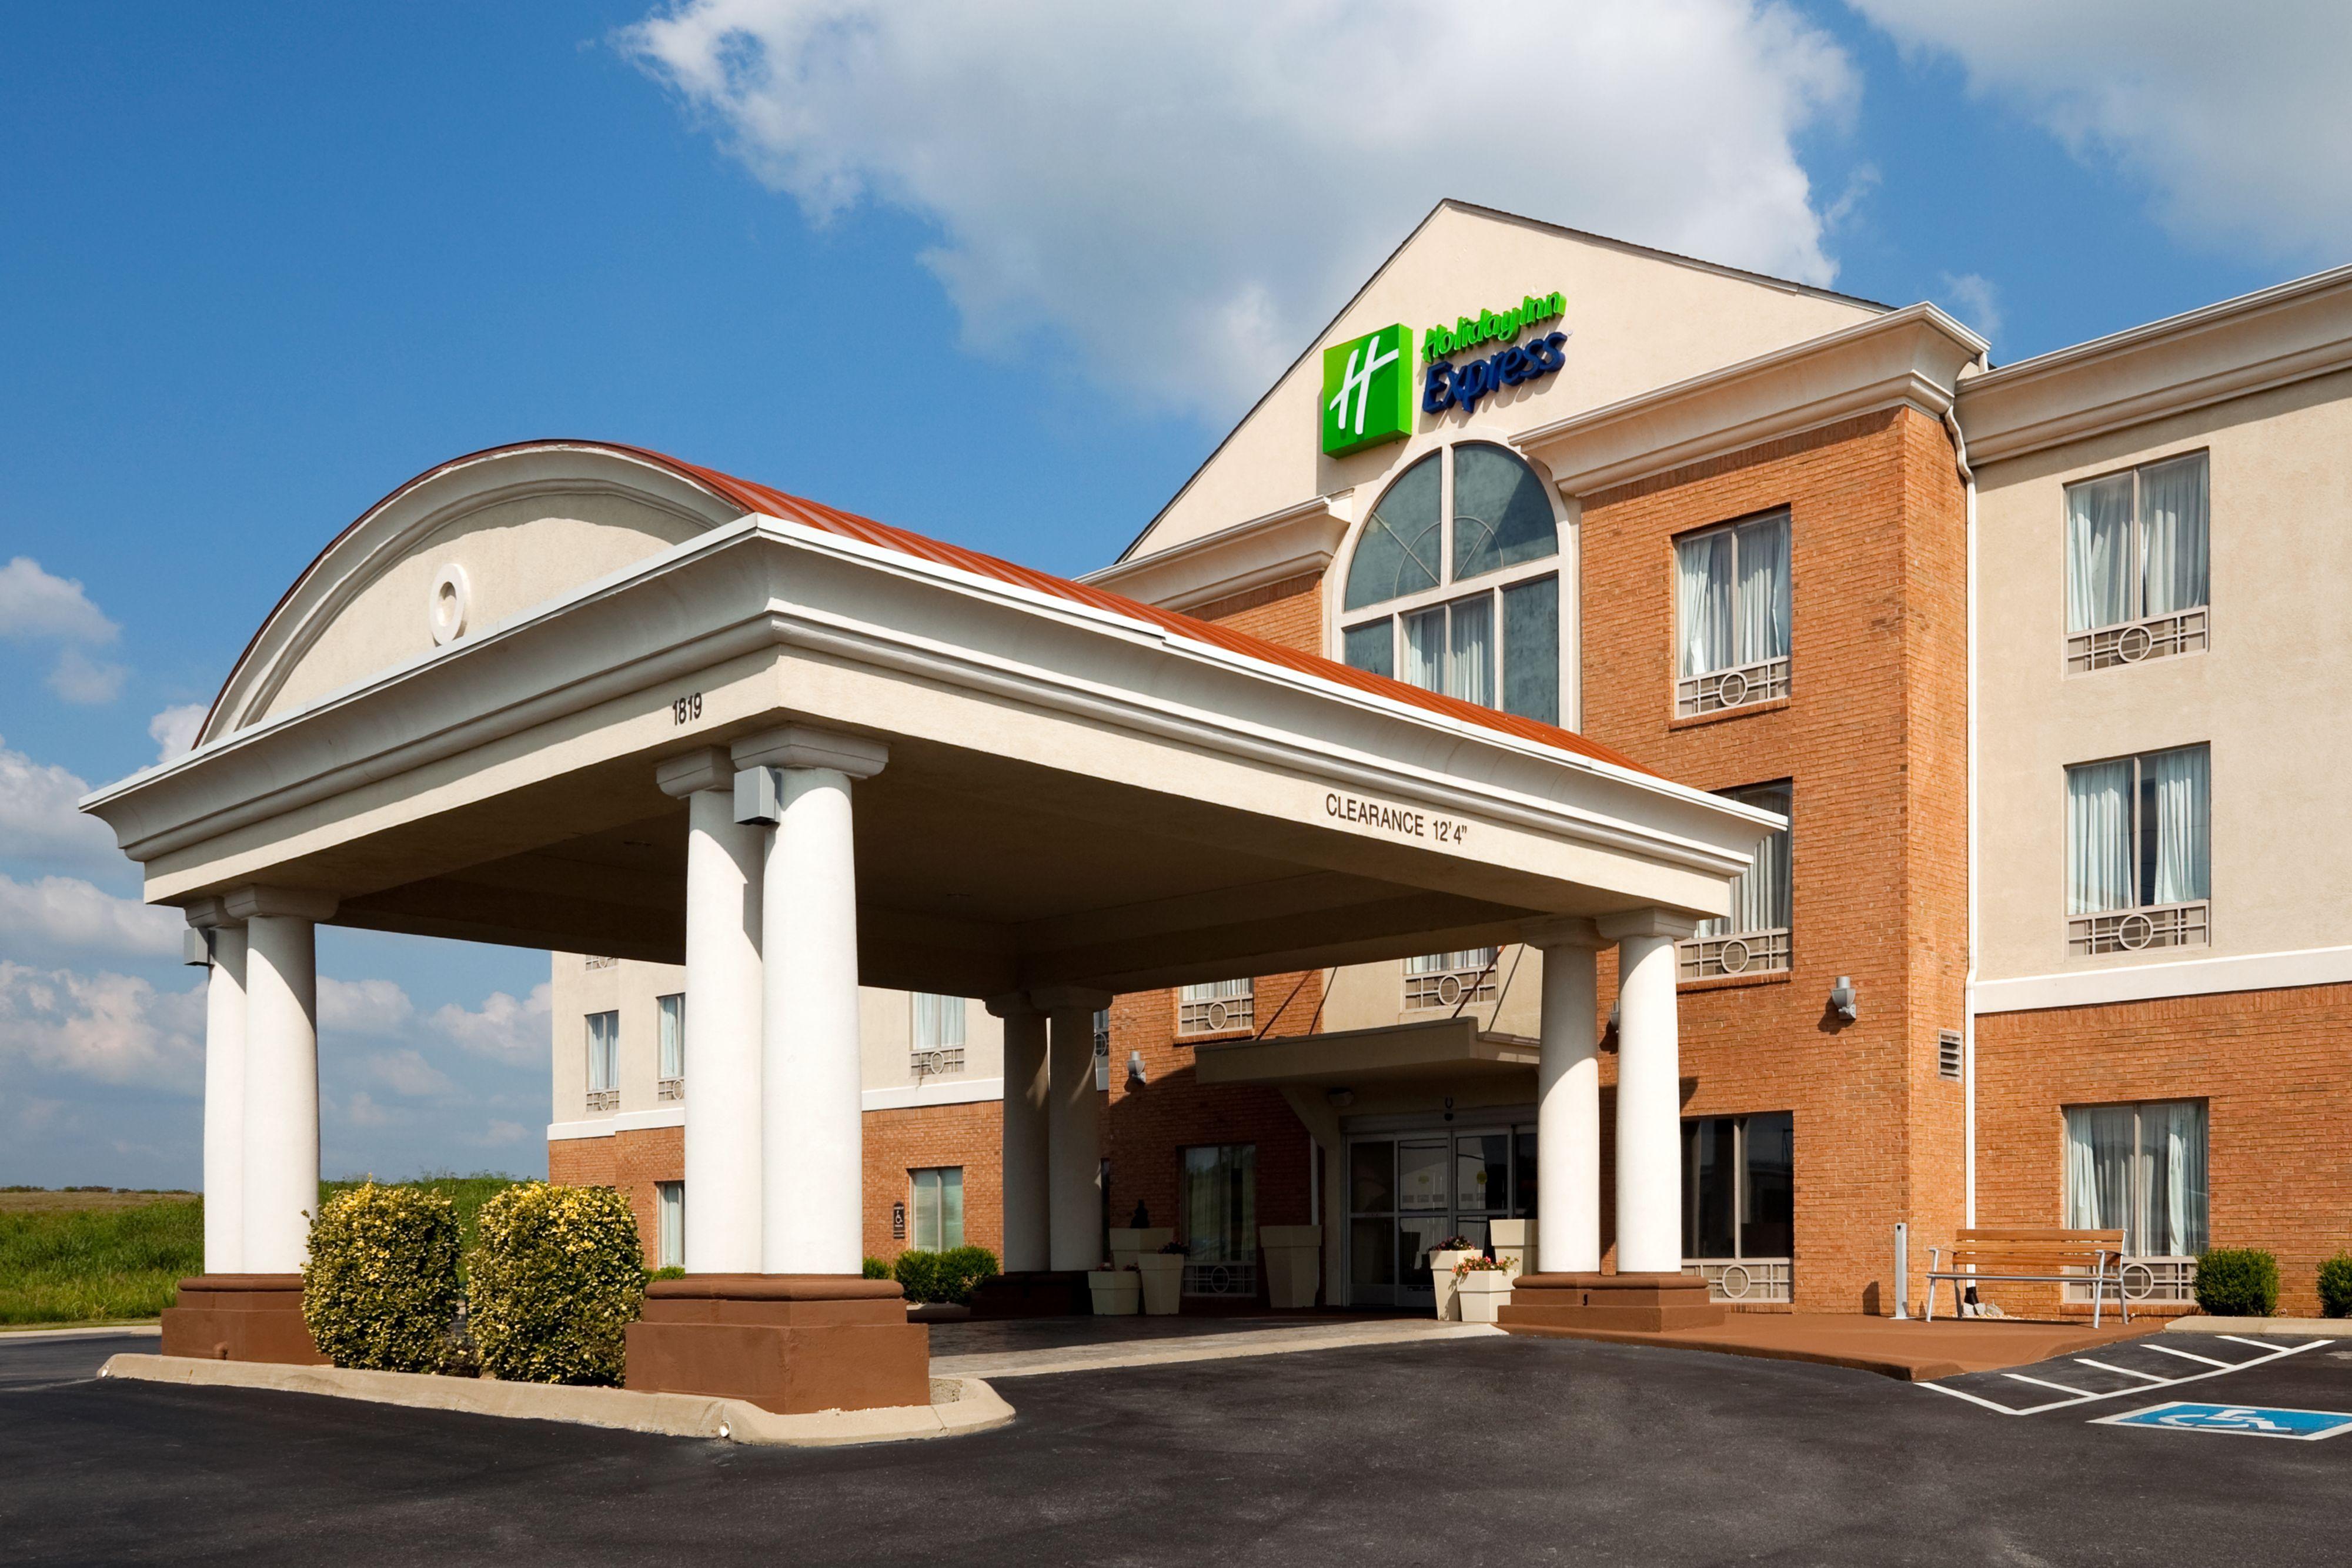 Holiday Inn Express & Suites Atascadero image 5